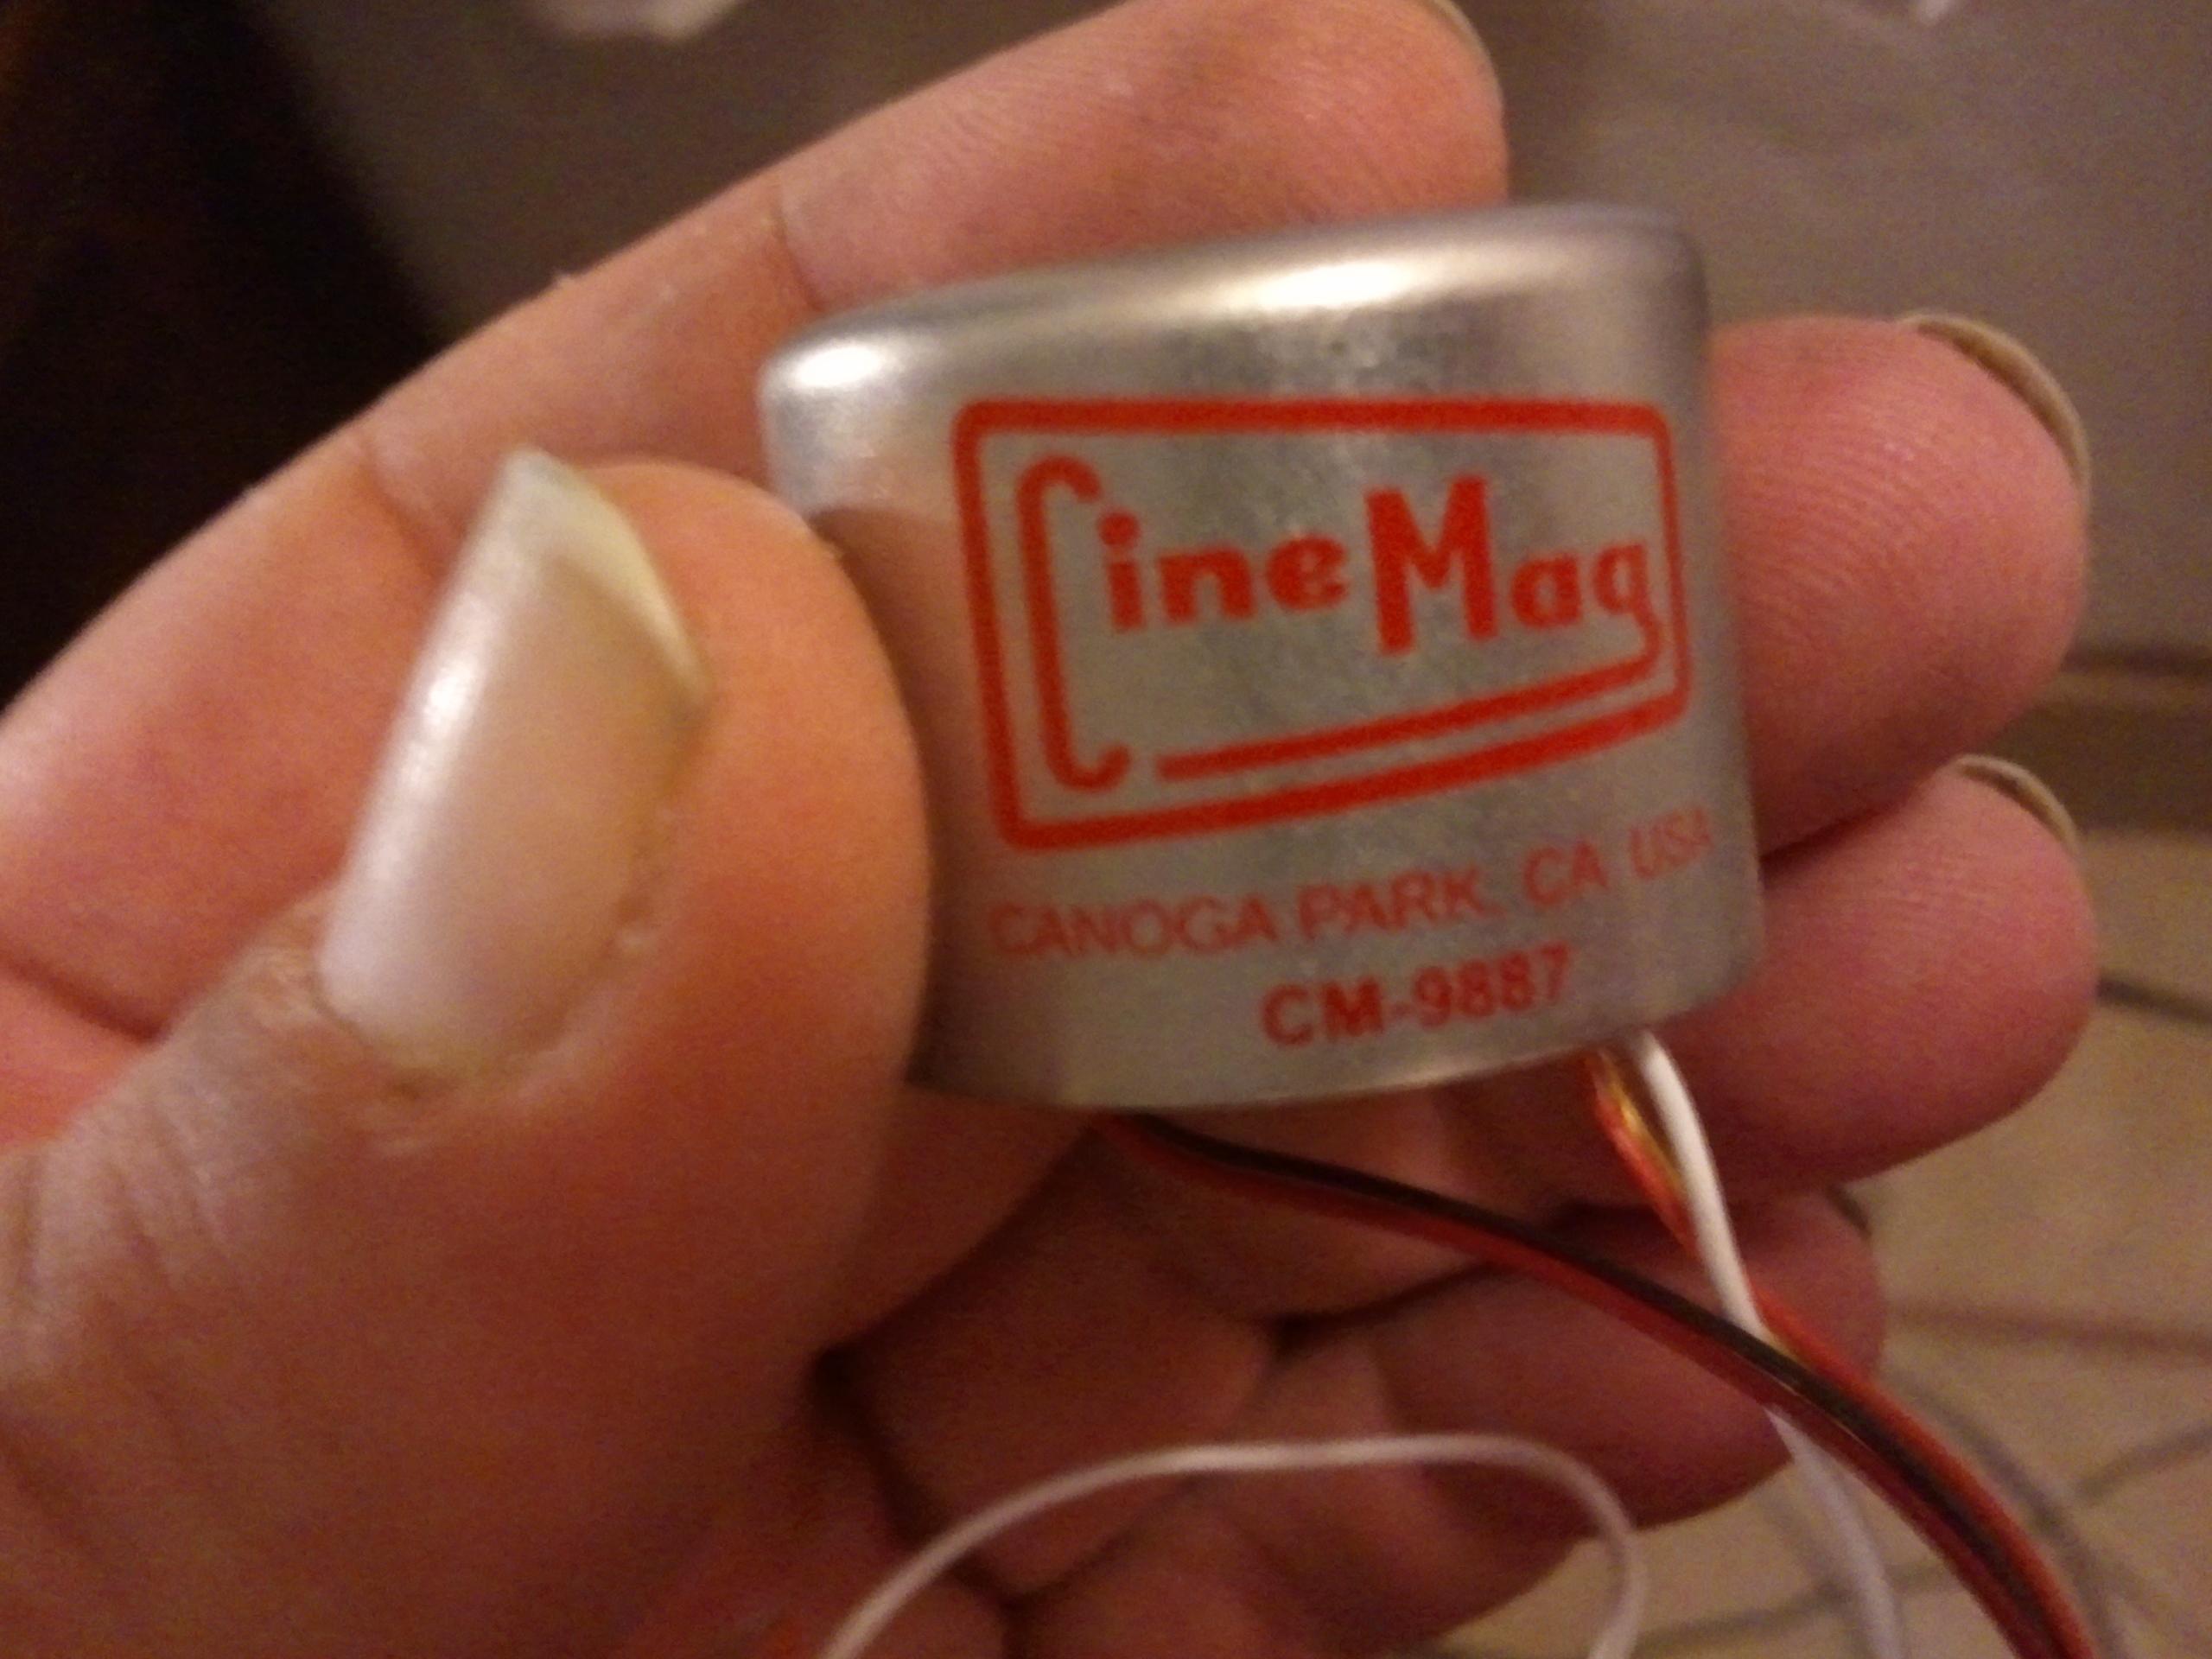 CineMag ribbon mic transformer